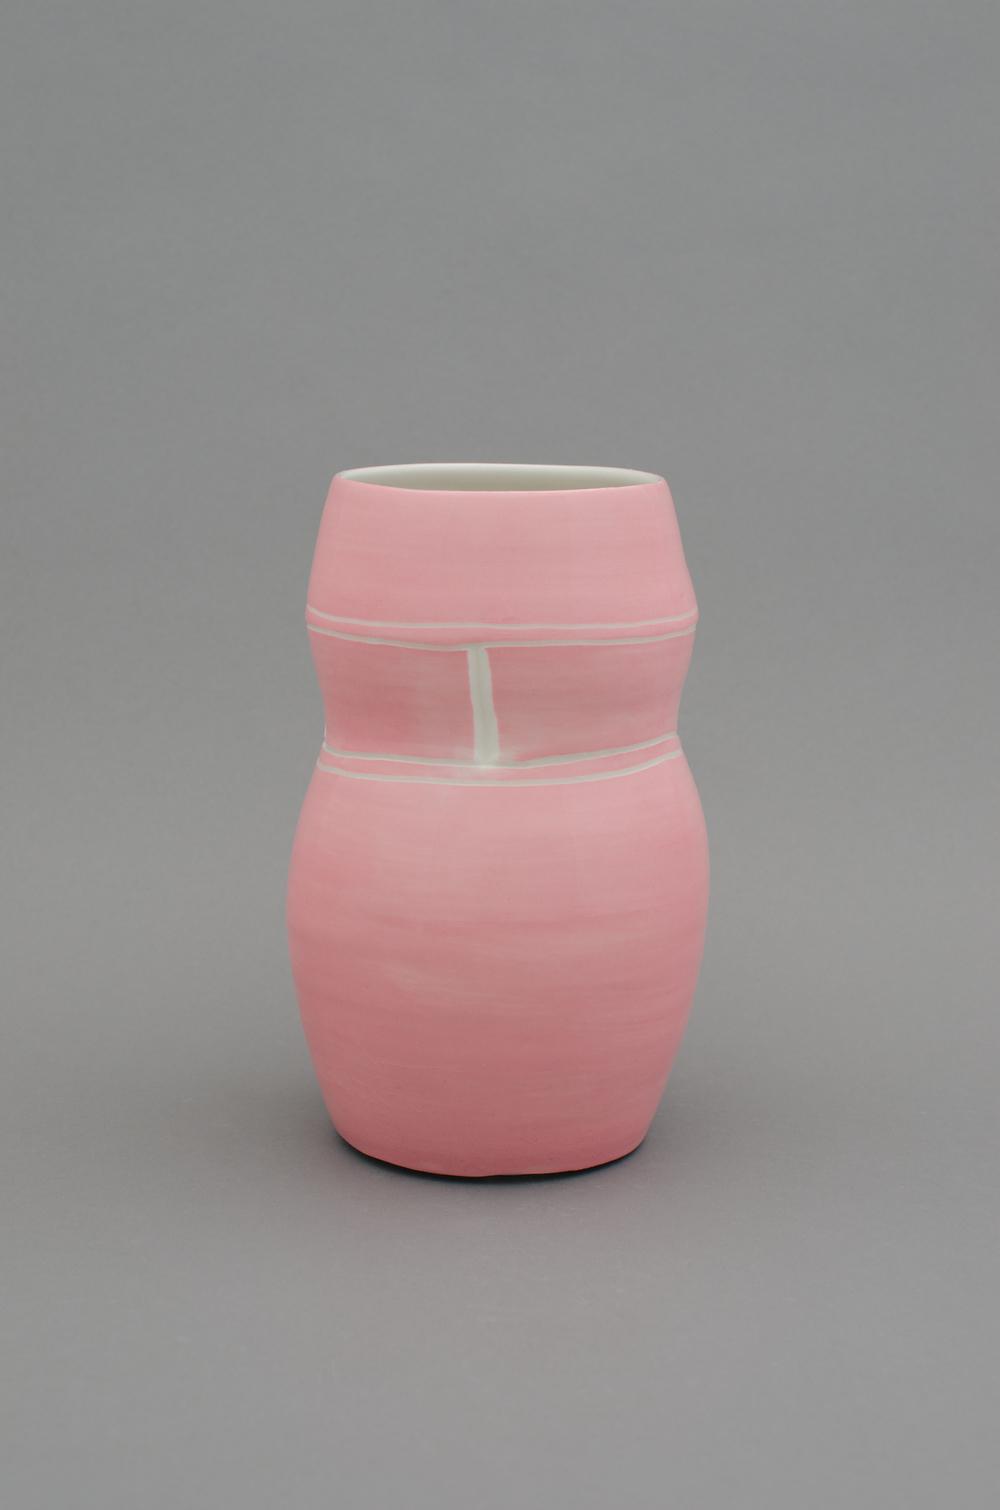 Shio Kusaka  Untitled (pink 1)  2012 Porcelain 9 1/2h x 5 3/4w x 5 3/4d in SK381